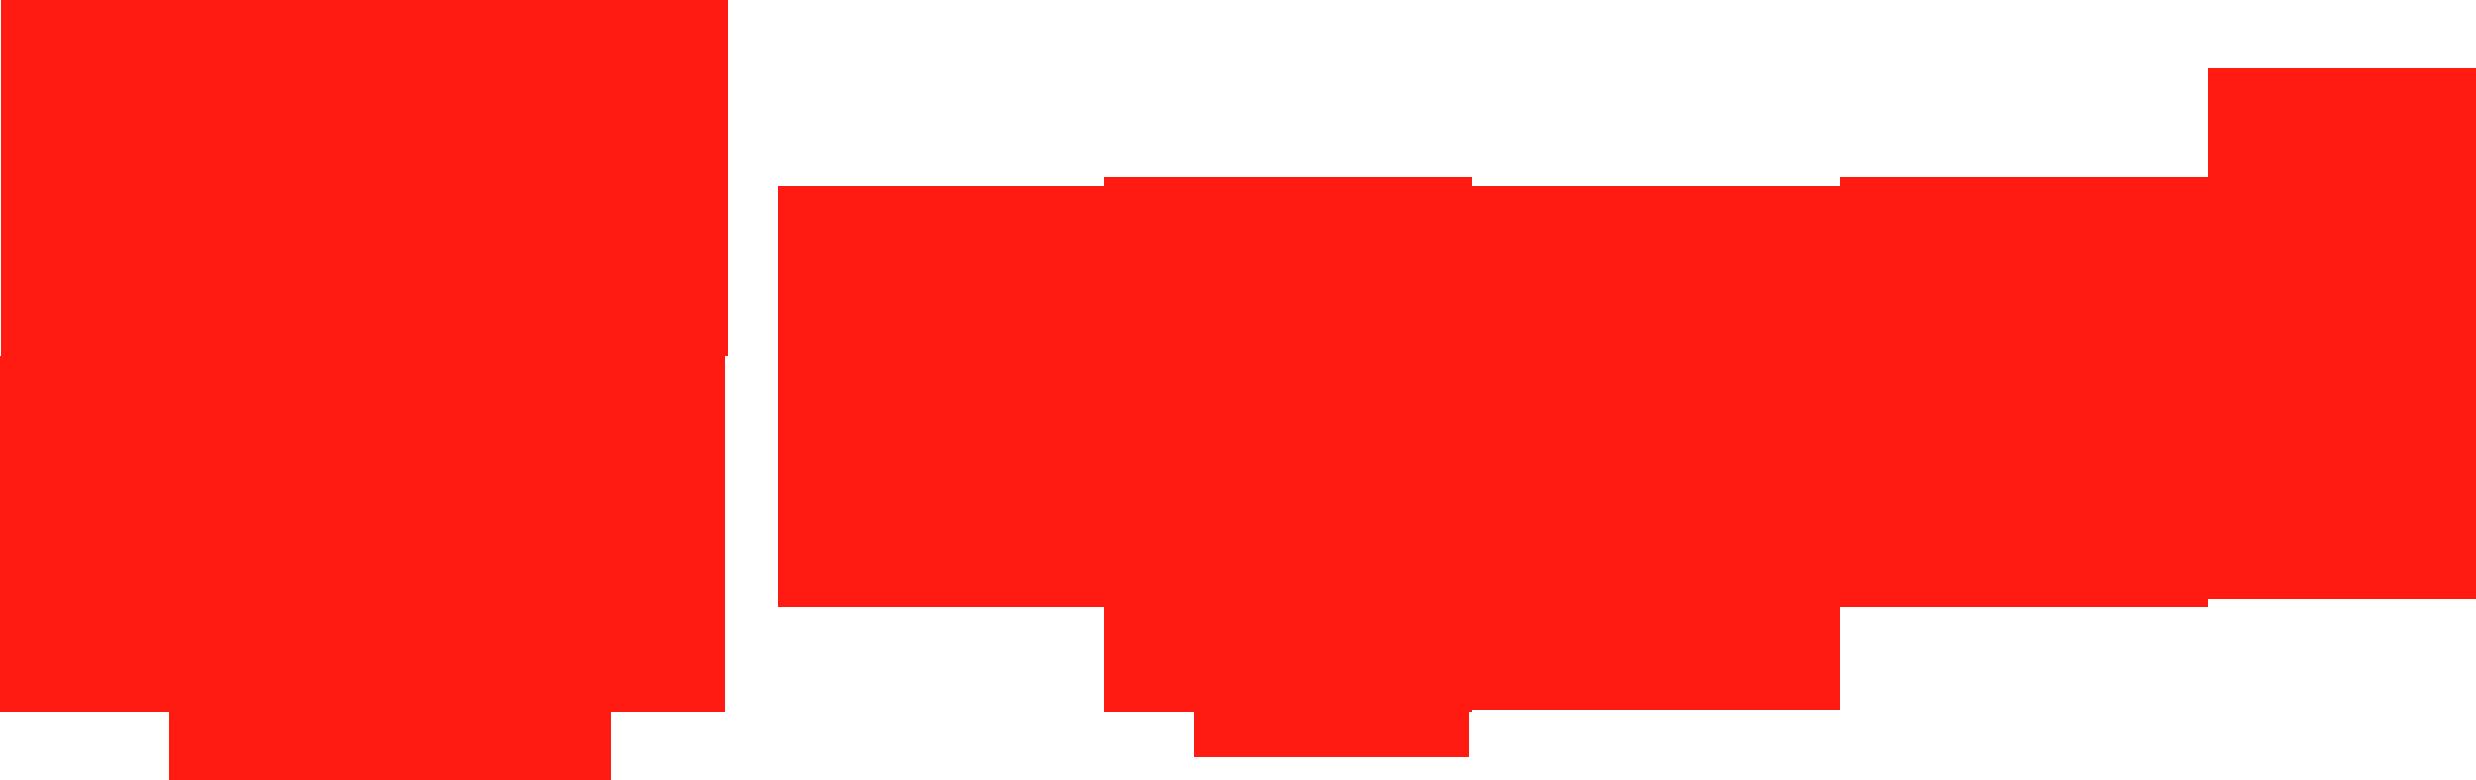 August playvox customer using quality to improve customer service